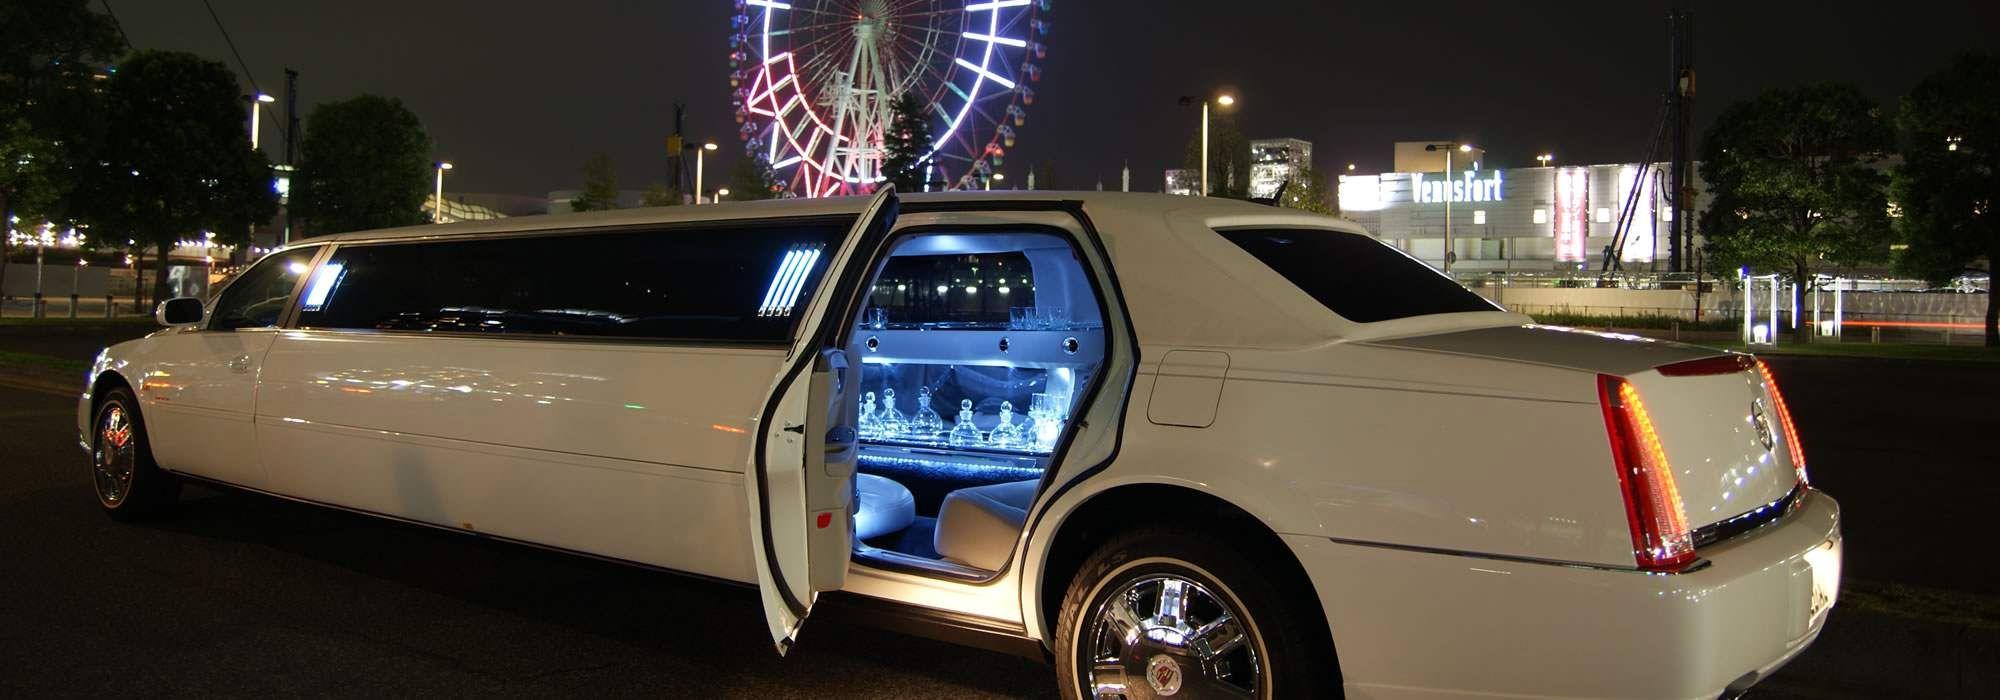 Www Hummer Limousine Car Wallpapers Com Location Limousine Anniversaire Location Limousine